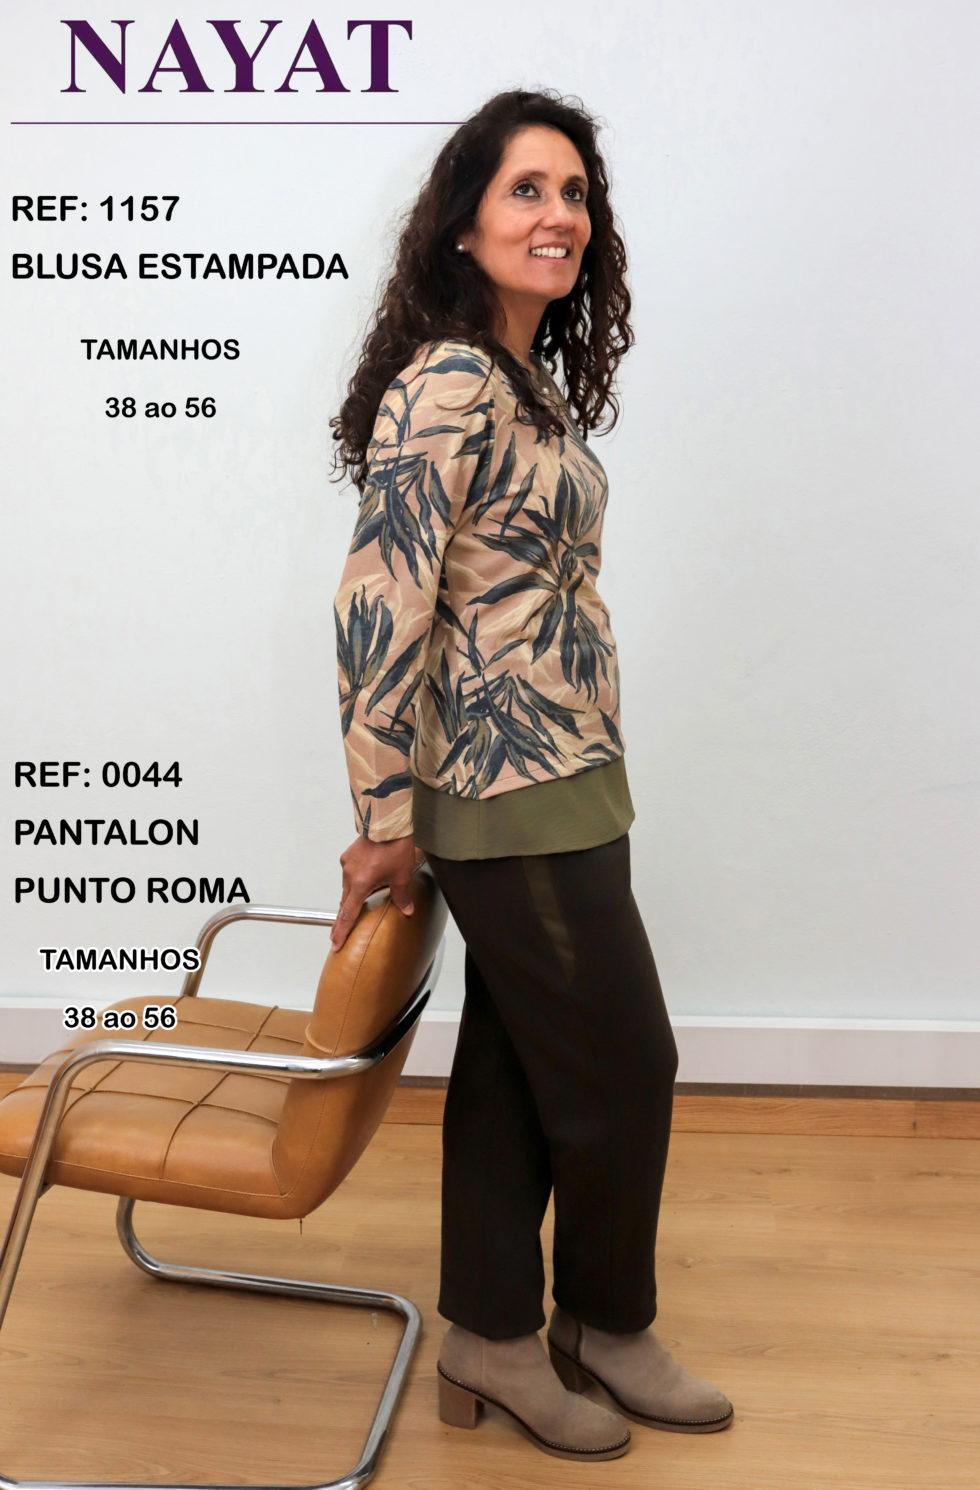 1157 + CALÇA 0044